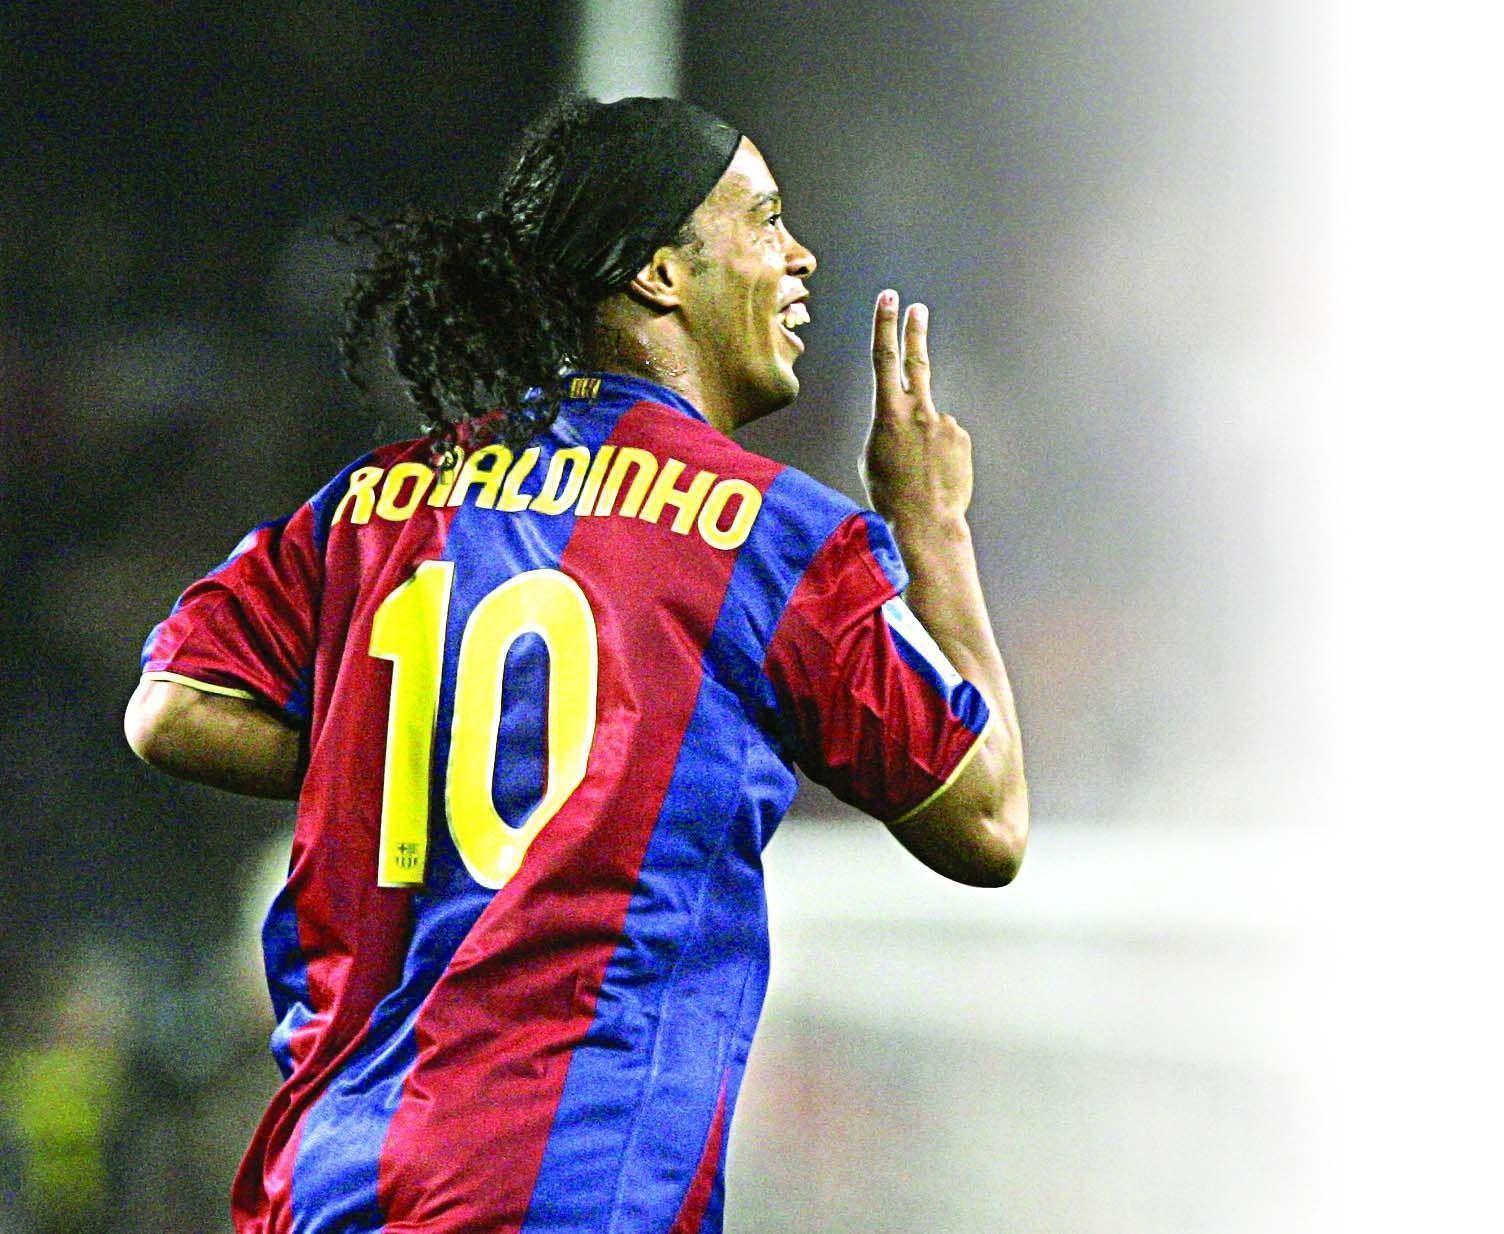 Image Gallery Ronaldinho Hd